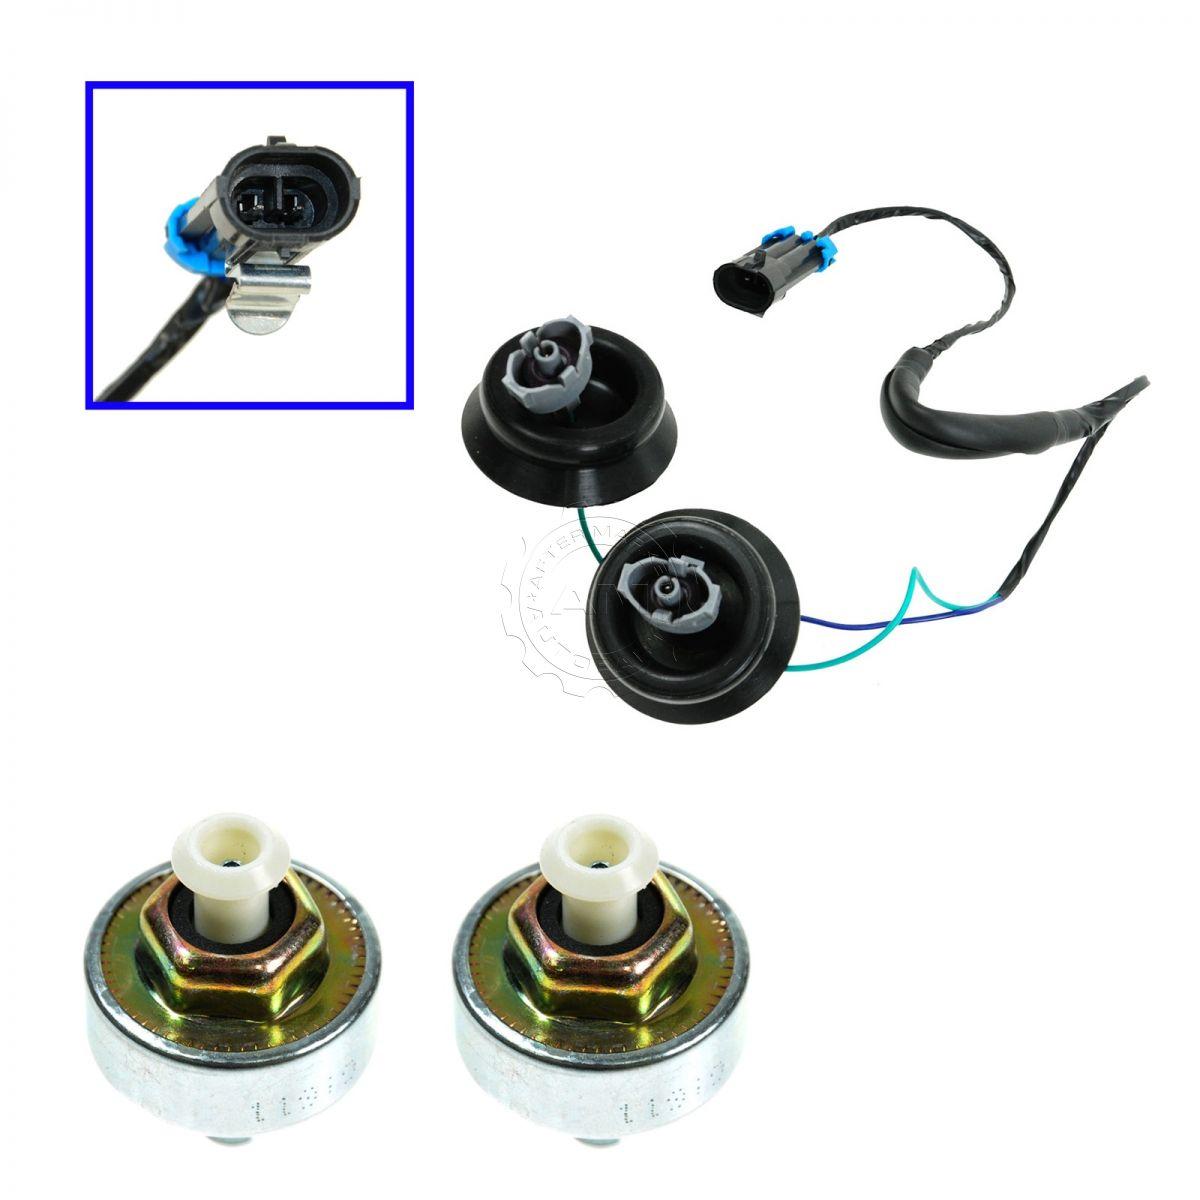 Knock Sensor With Harness Pair Kit Set For Chevy Gmc Silverado Oxigen Sencer 2000 Jimmy Wiring Sierra Cadillac